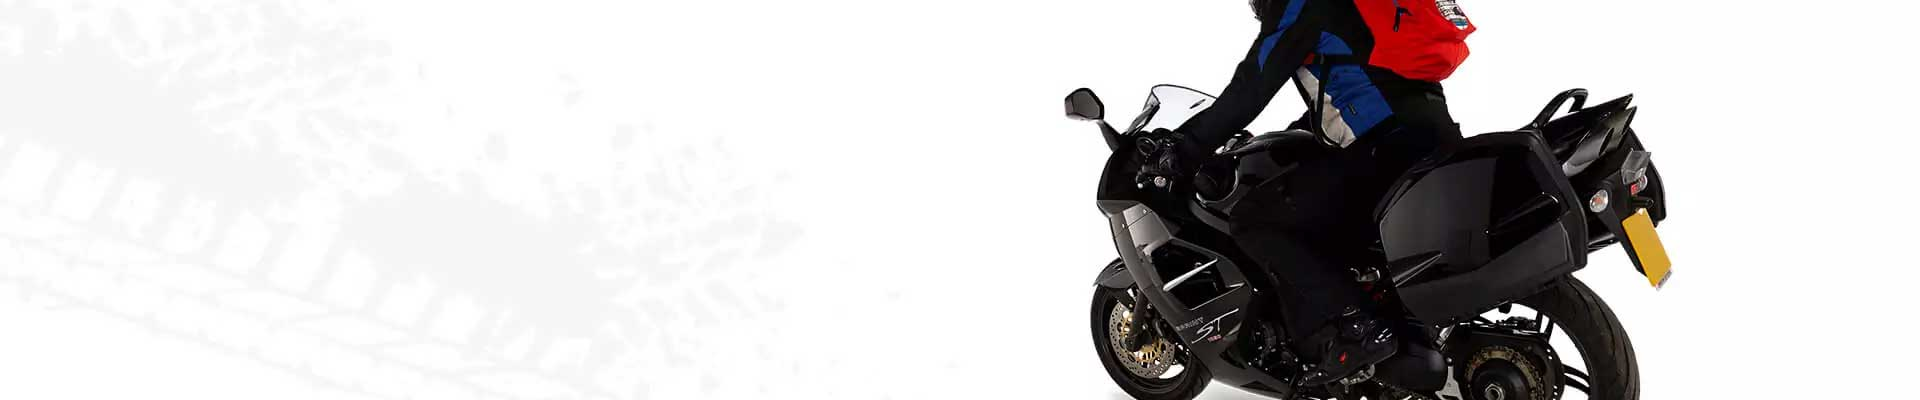 commuter-bike-insurance-bike-rider